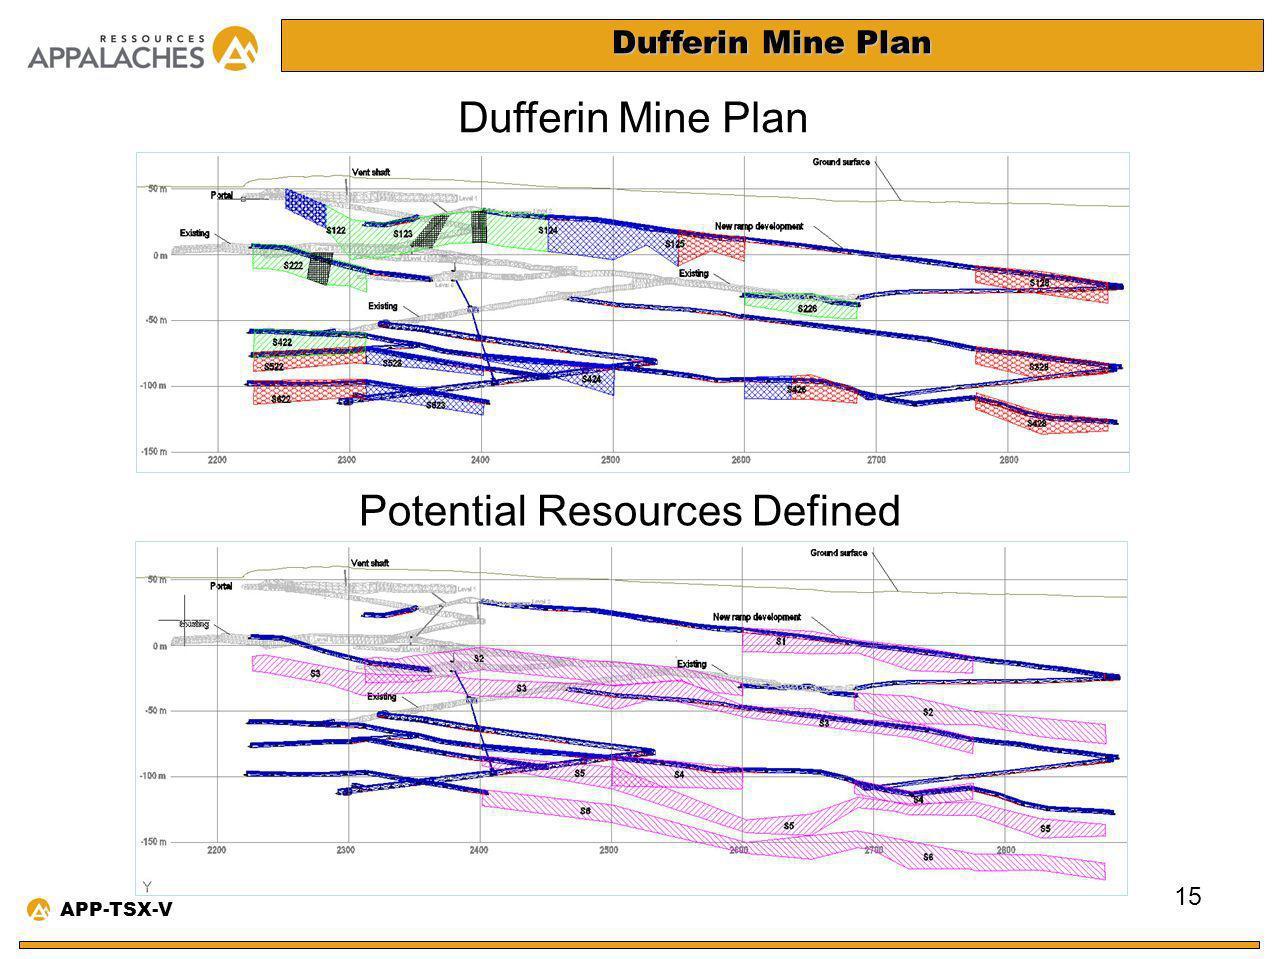 Dufferin Mine Plan 15 APP-TSX-V Potential Resources Defined Dufferin Mine Plan